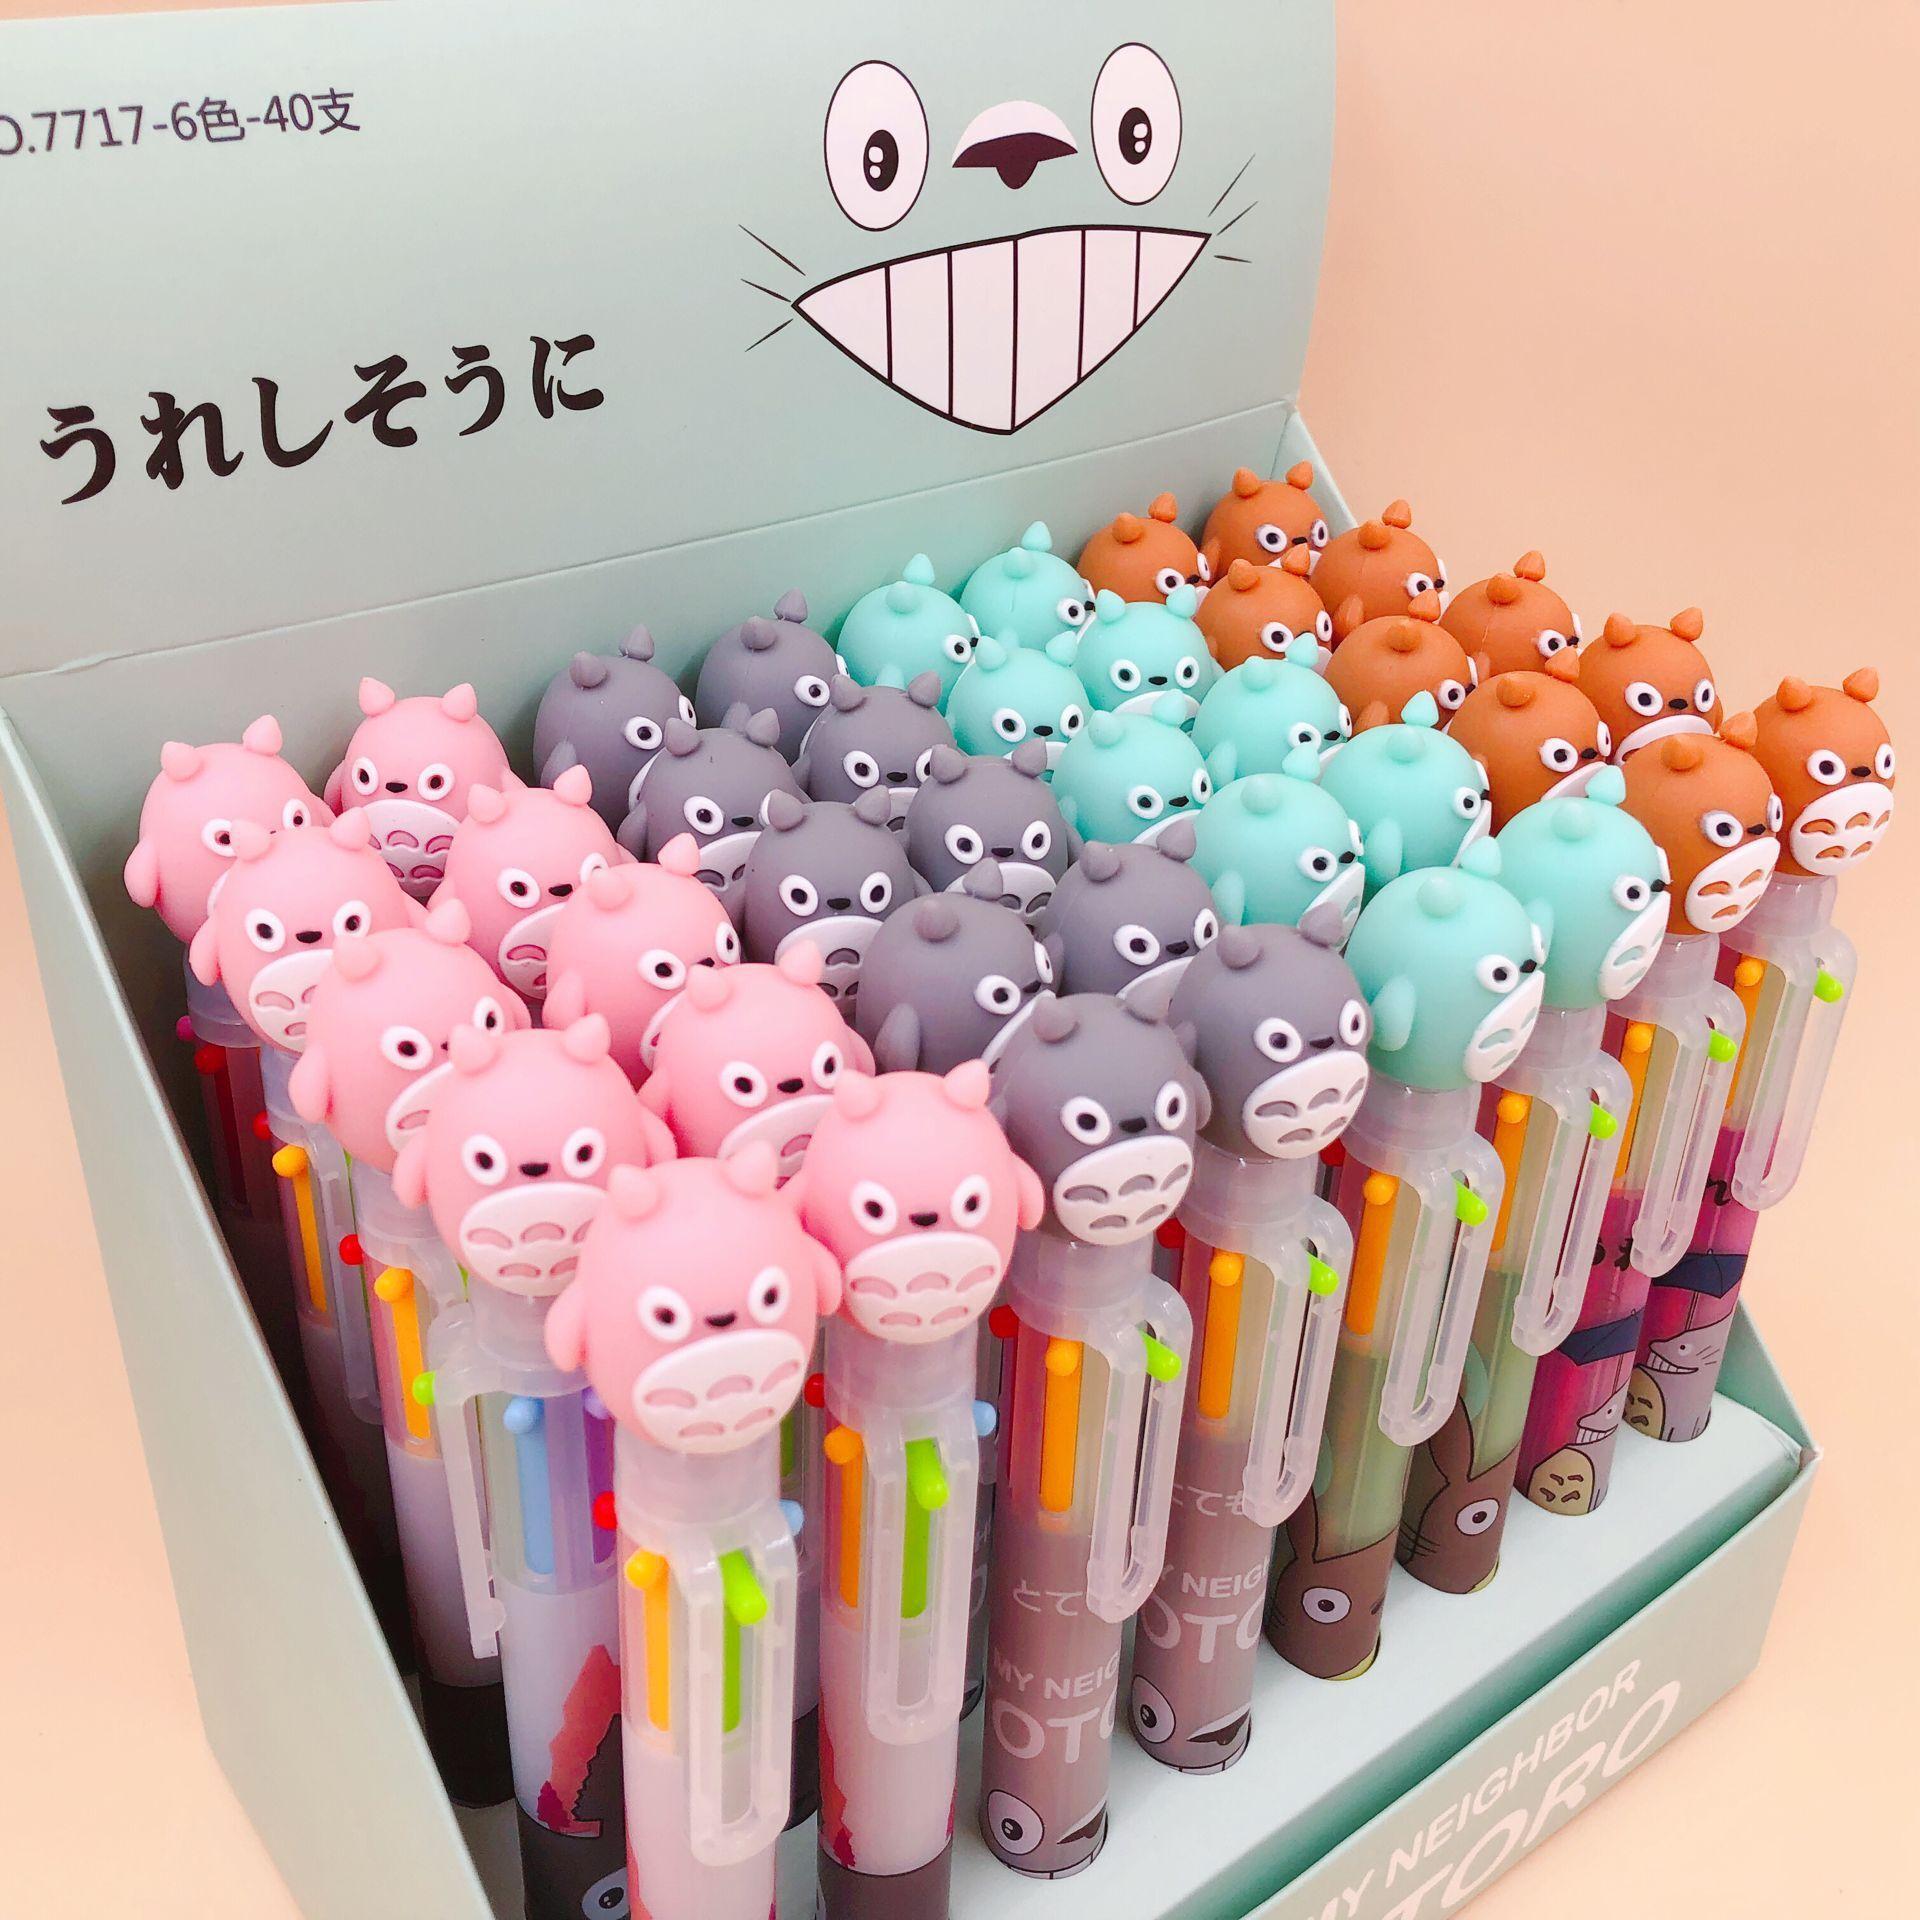 18 unids/lote Totoro cabeza de silicona dibujos animados 6 colores bolígrafo grueso escuela Oficina suministro regalo papelería Escolar